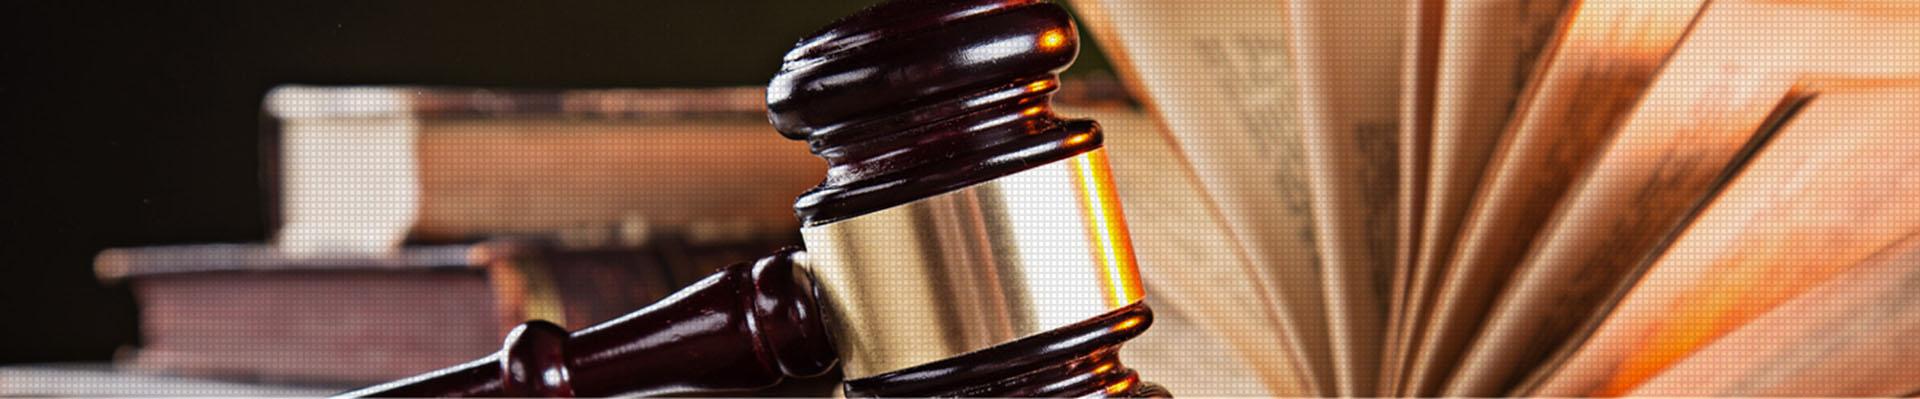 Toledo Car Accident Attorney | Ohio Auto Accident Lawyer | Gallon Law